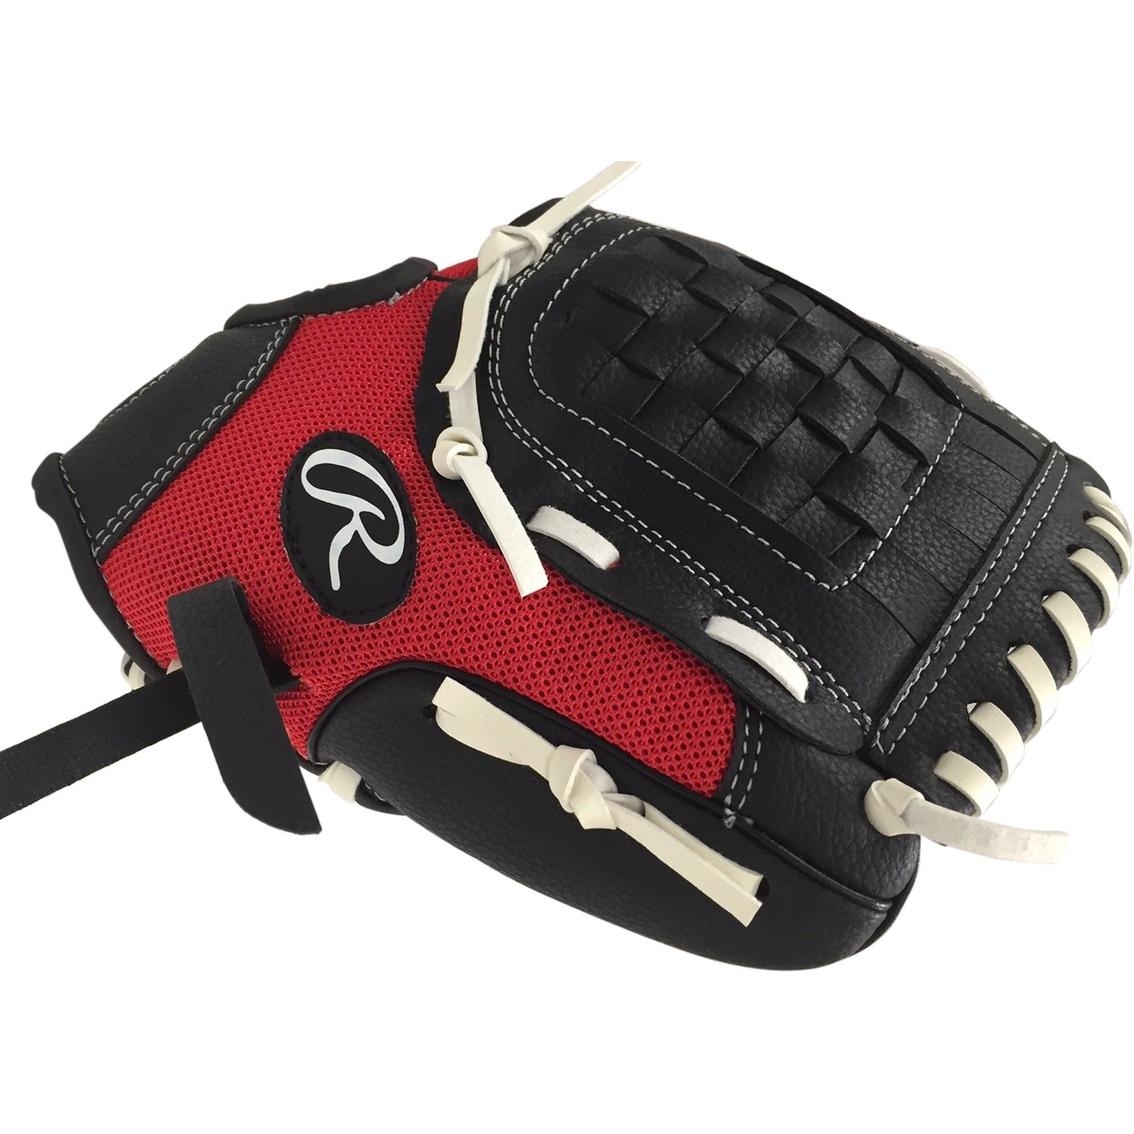 Rawlings Playmaker Series 10.5 In. Softball Baseball Glove ... db9b4b89617d